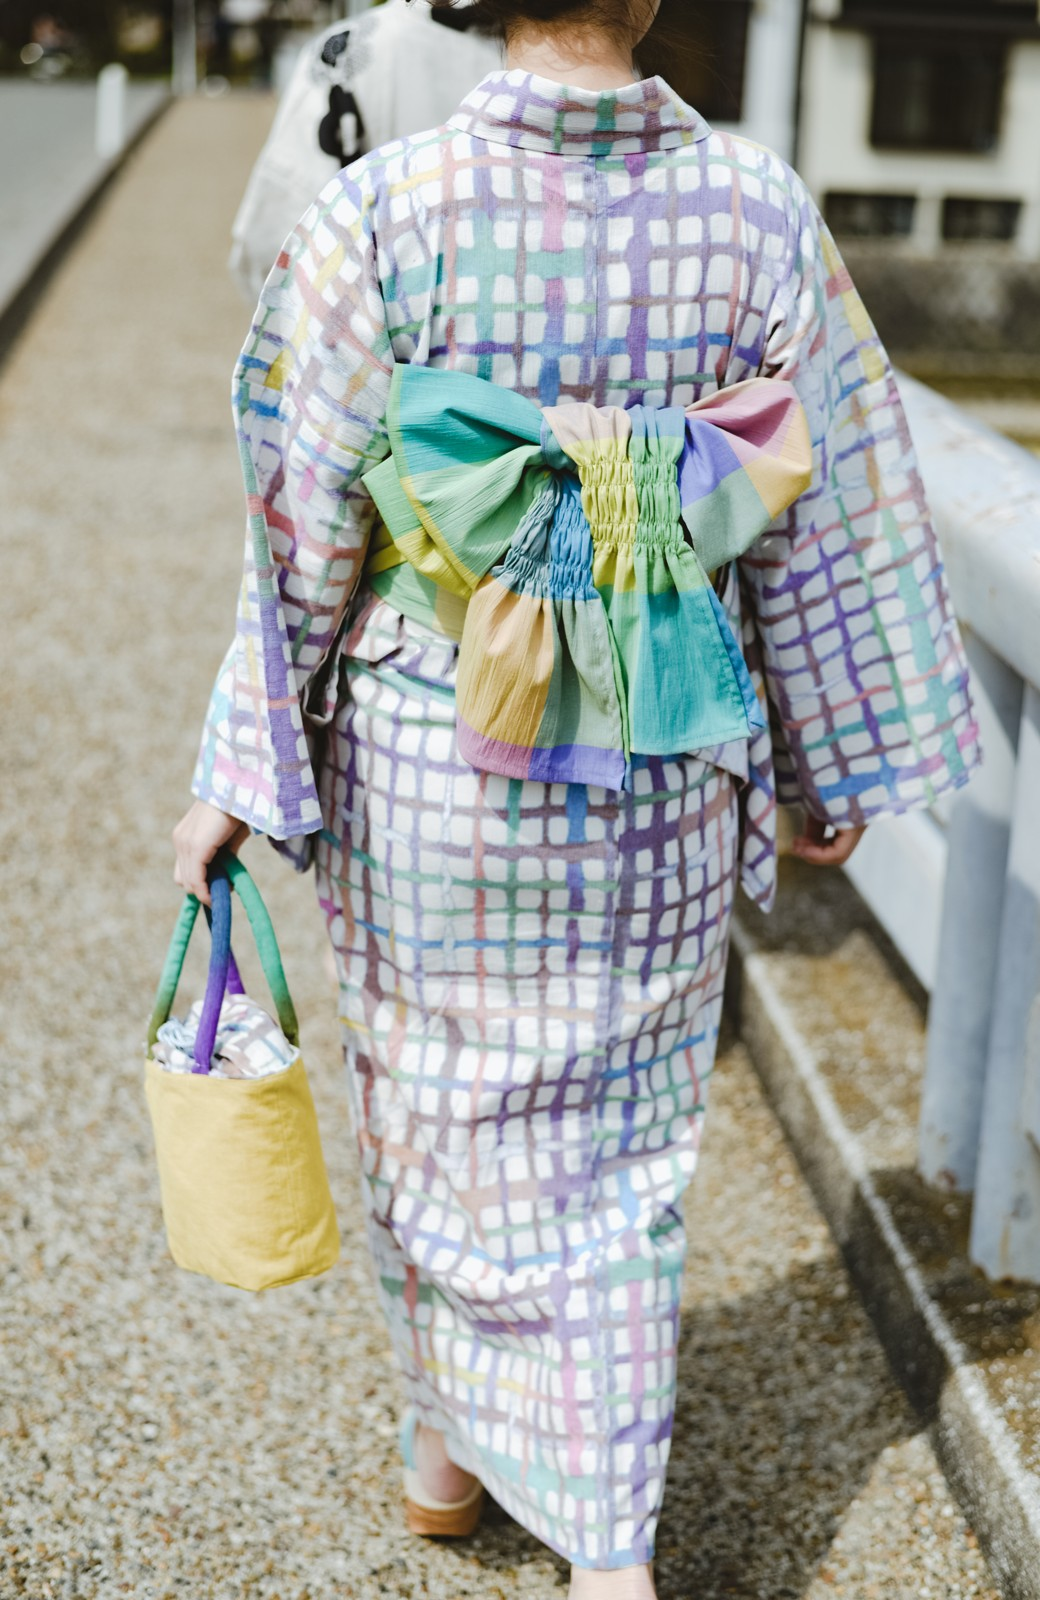 haco! ひでや工房 京都のへこ帯 大格子 <カラフル>の商品写真6